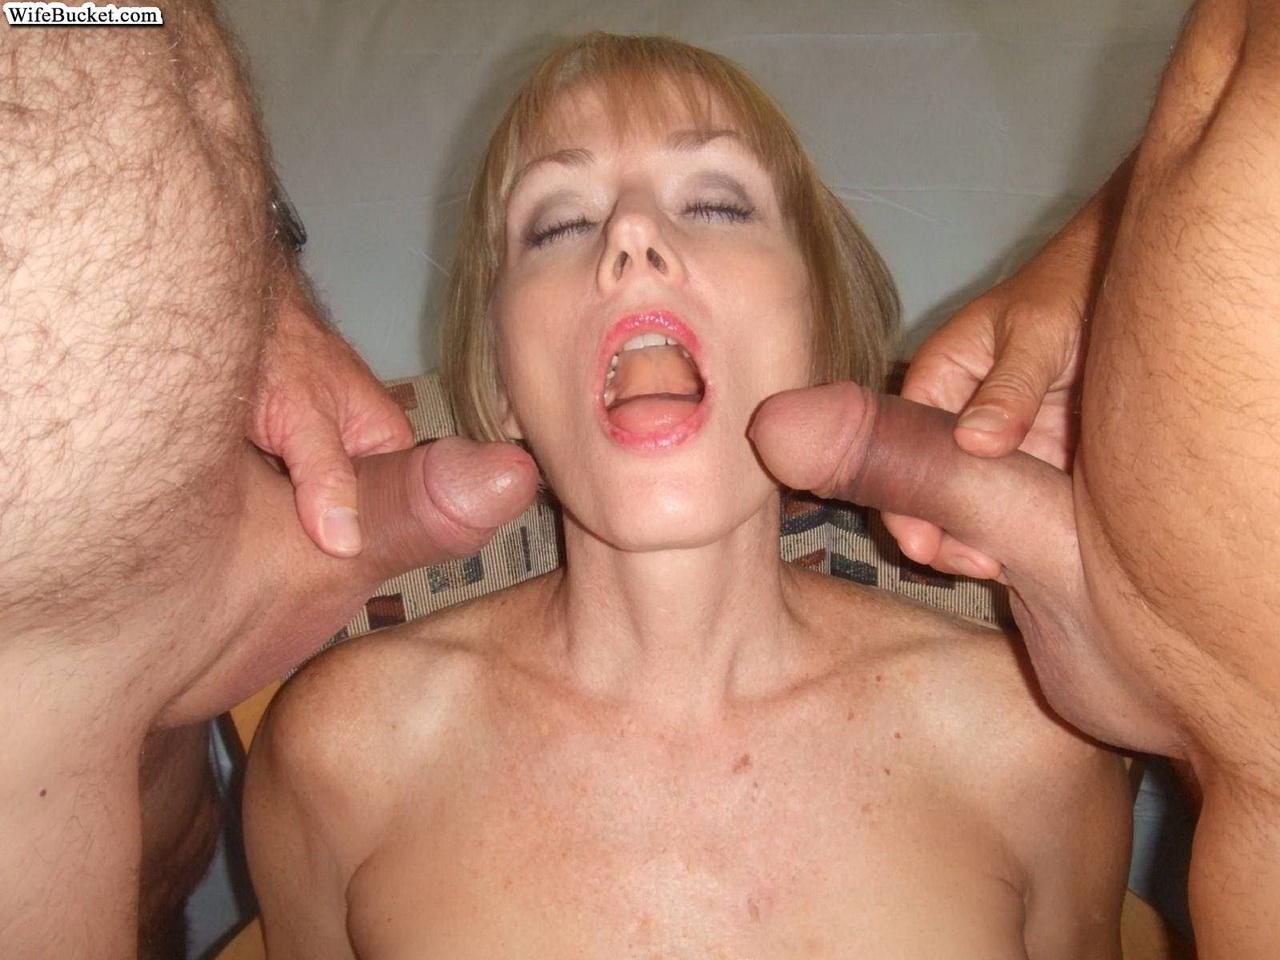 Секс бабушки в сперме фото 28 фотография